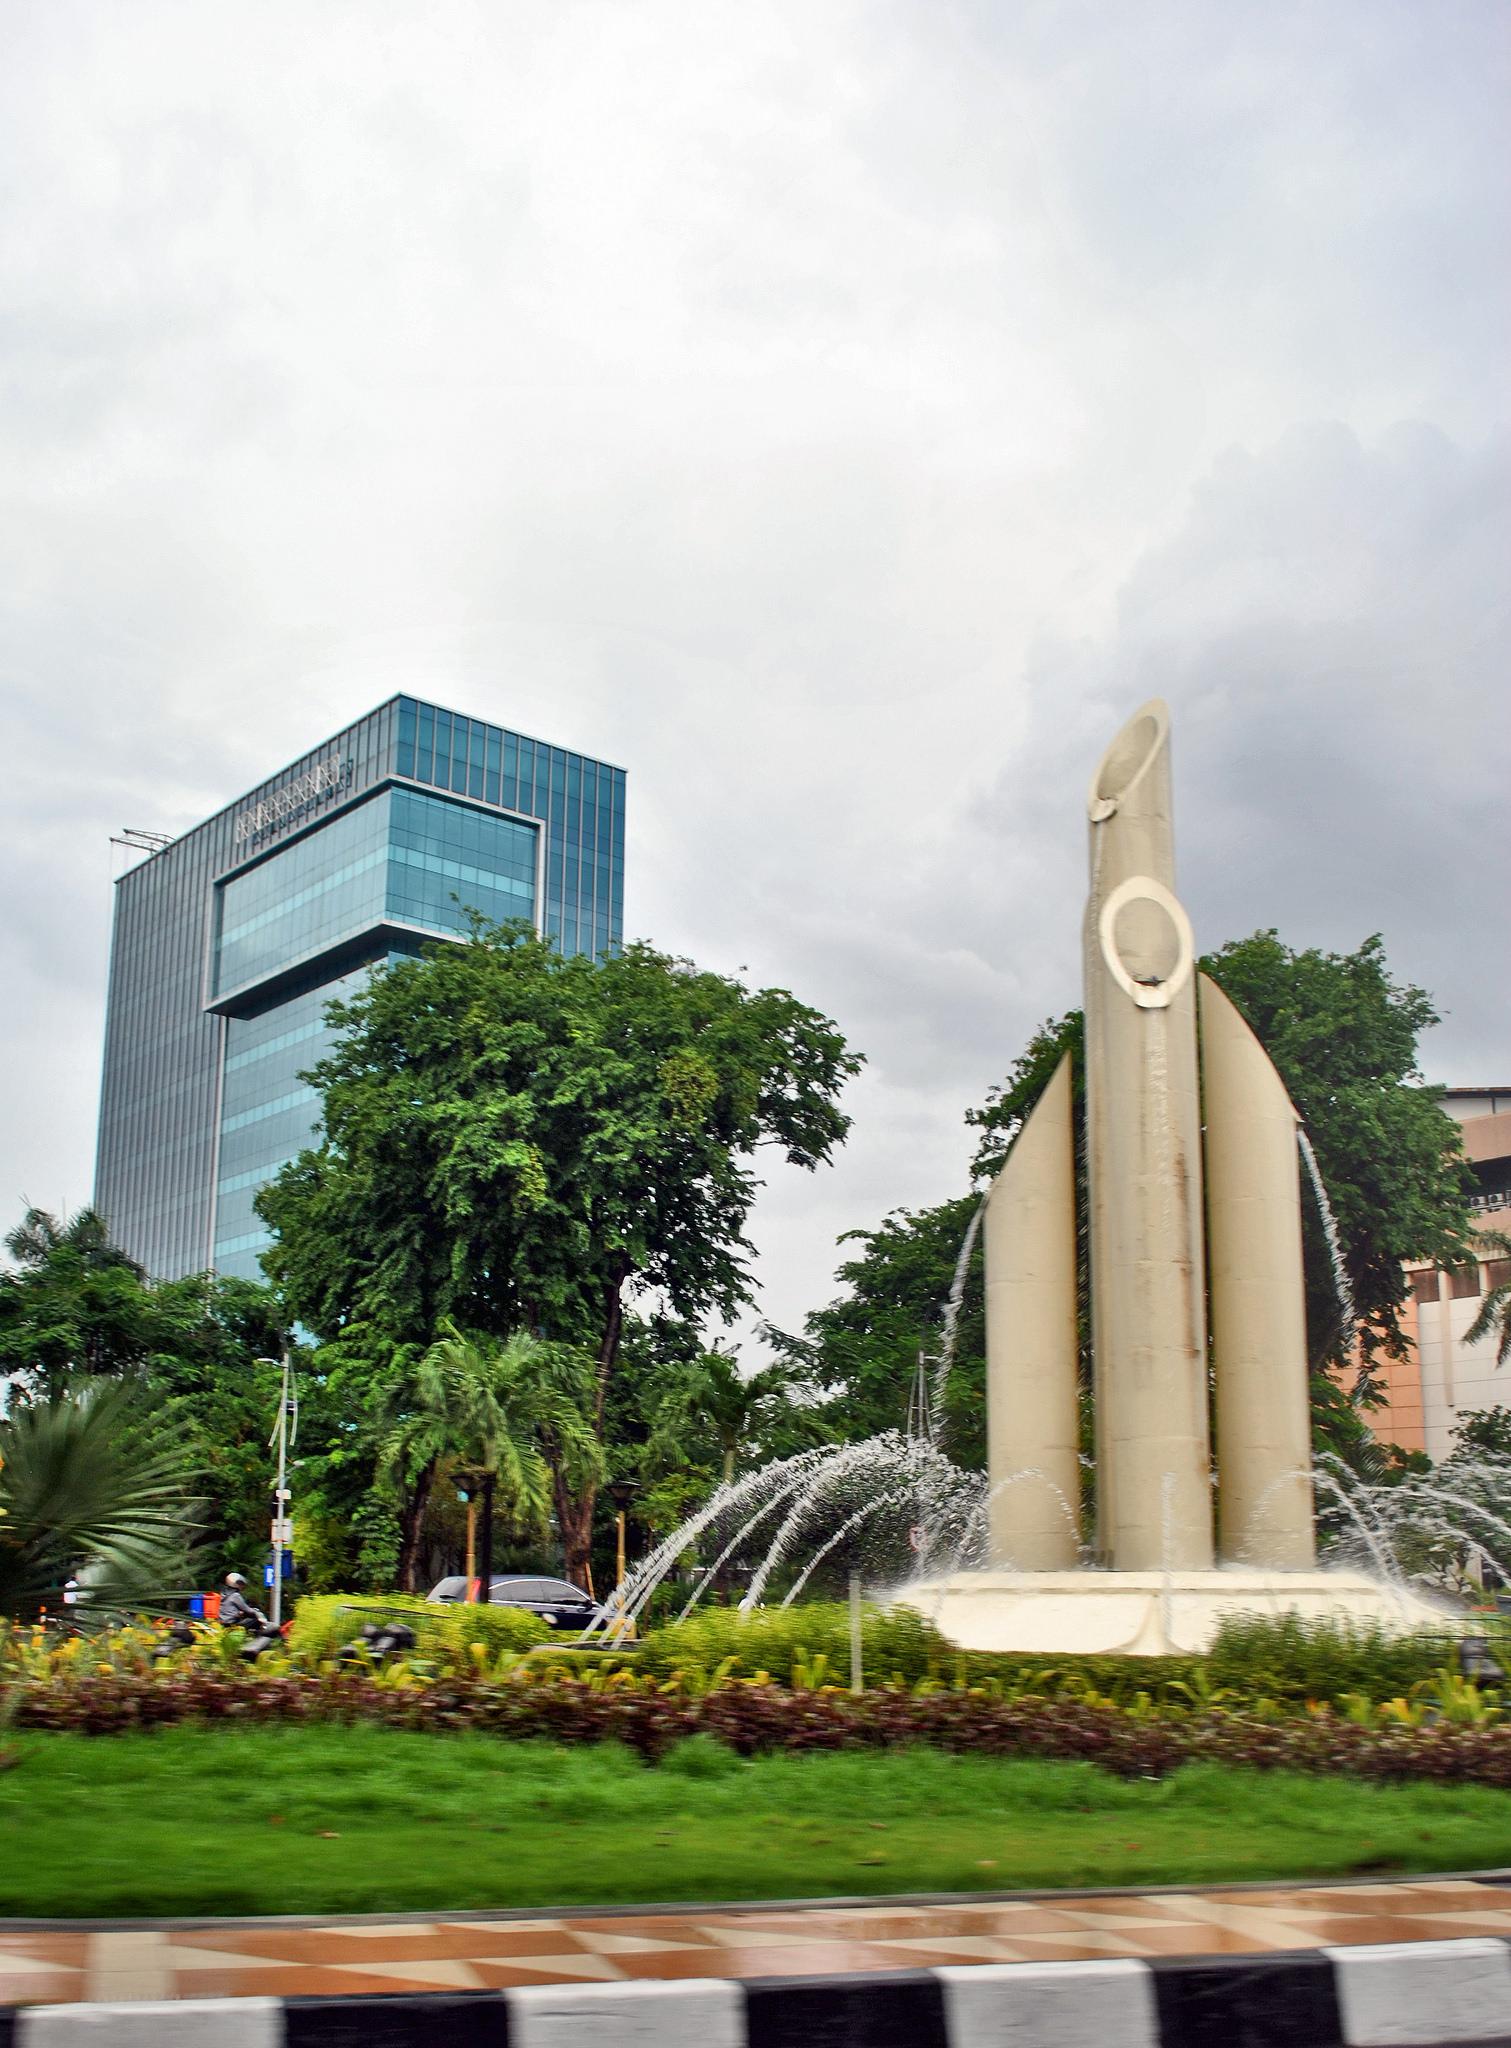 Bambu Runcing Monument